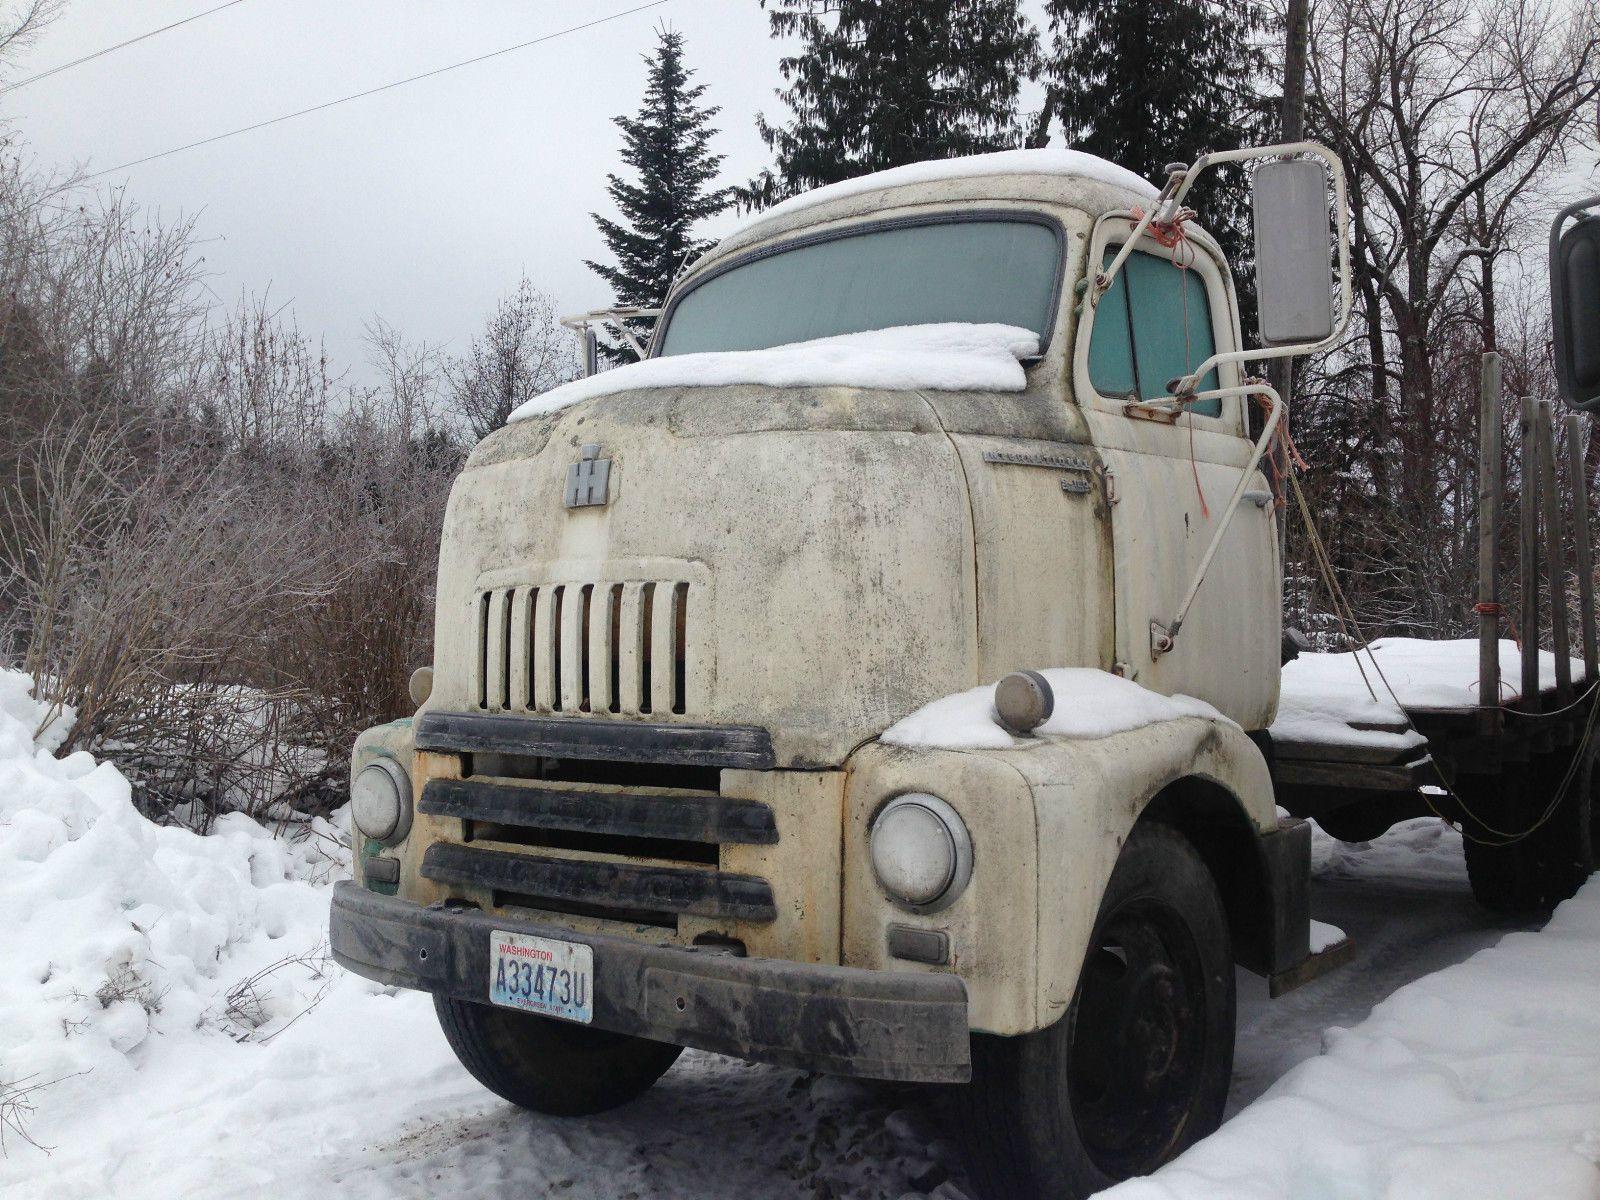 A Wishlist for ATS [American Truck Simulator] [Blogs]